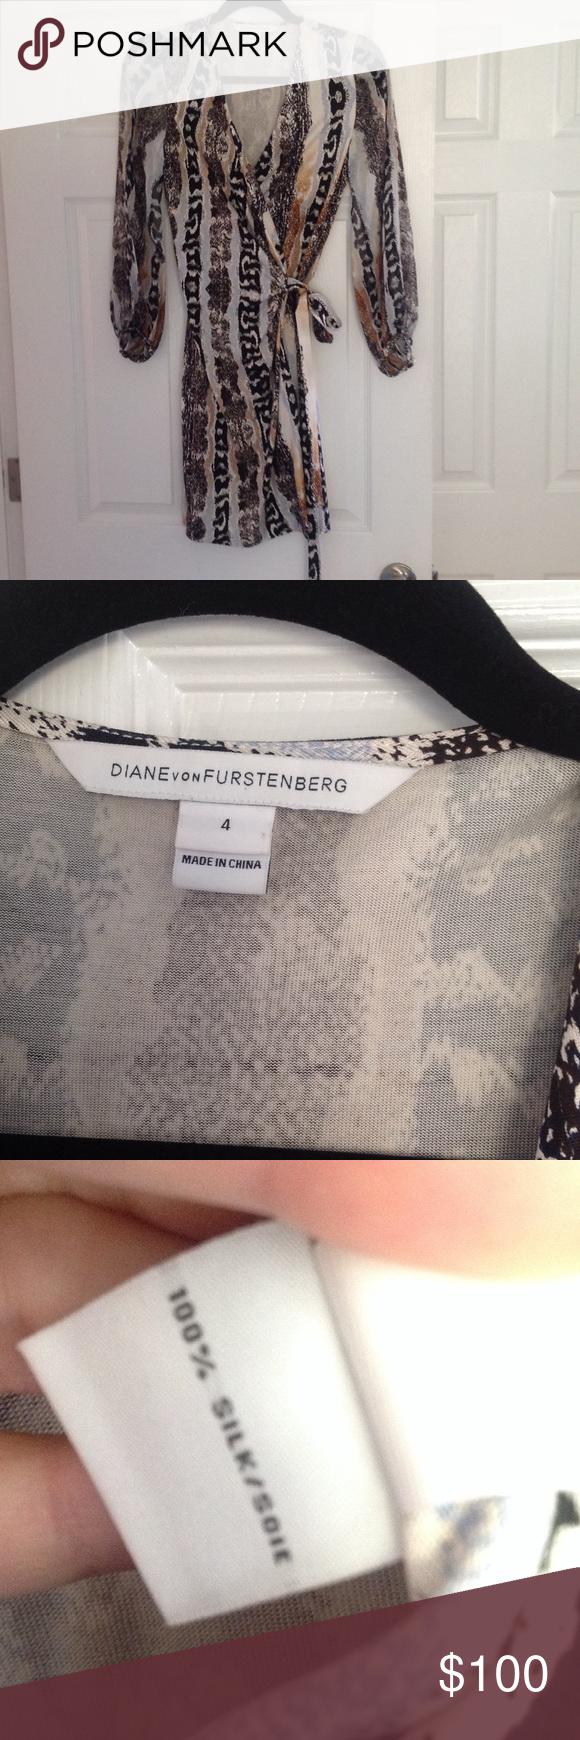 Diane Von Furstenberg wrap dress 100% silk Like new.  Beautiful sheer sleeves. Diane von Furstenberg Dresses Long Sleeve